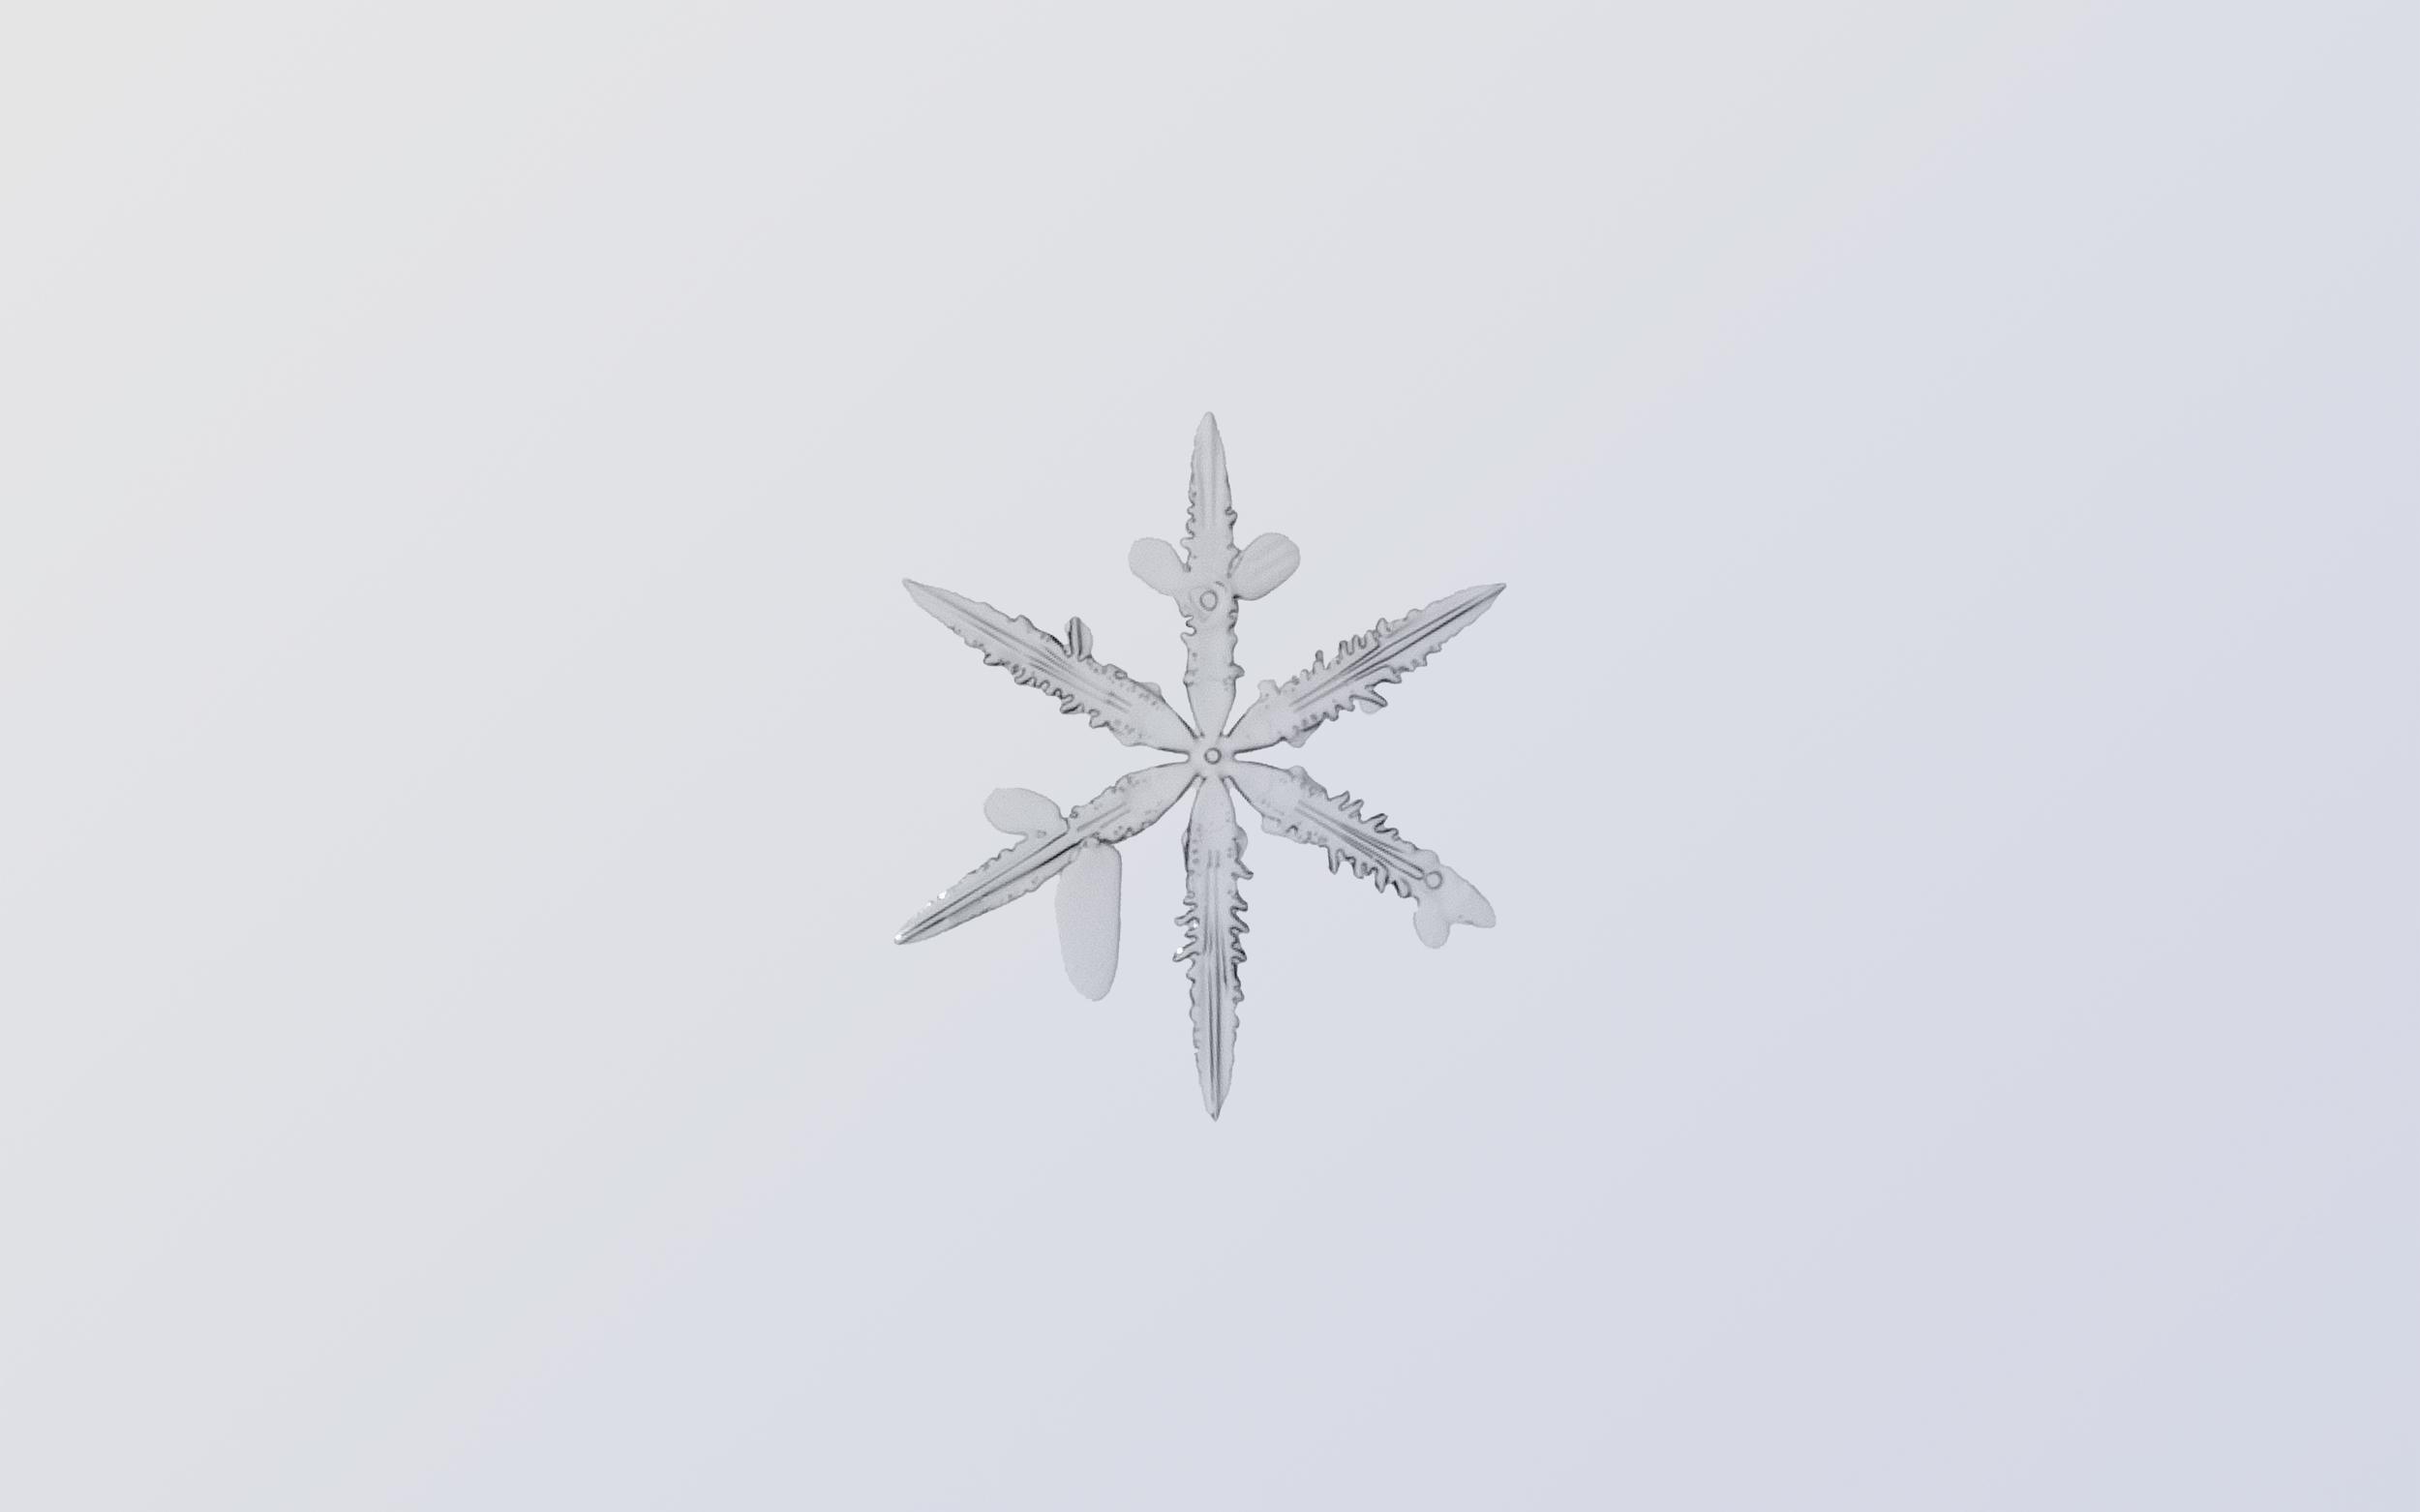 Snowflake Nº 3